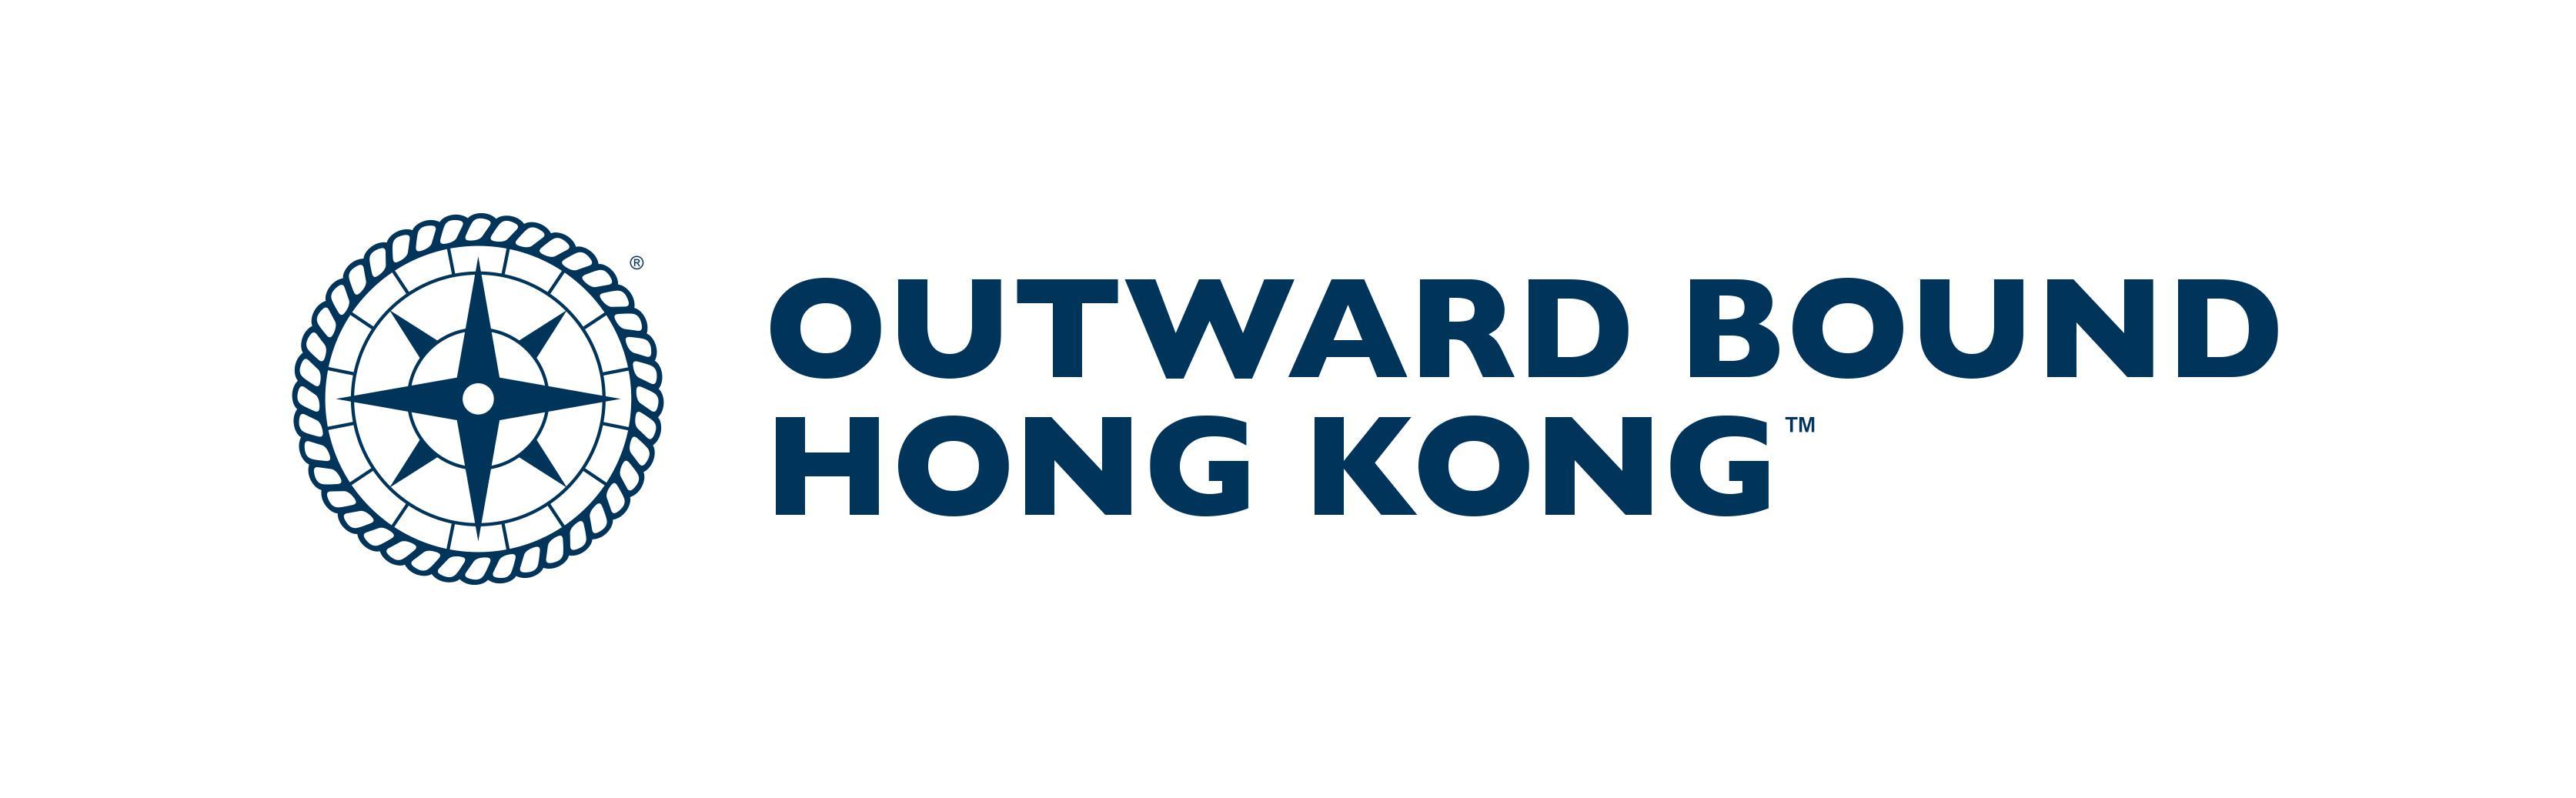 Outward Bound Hong Kong logo